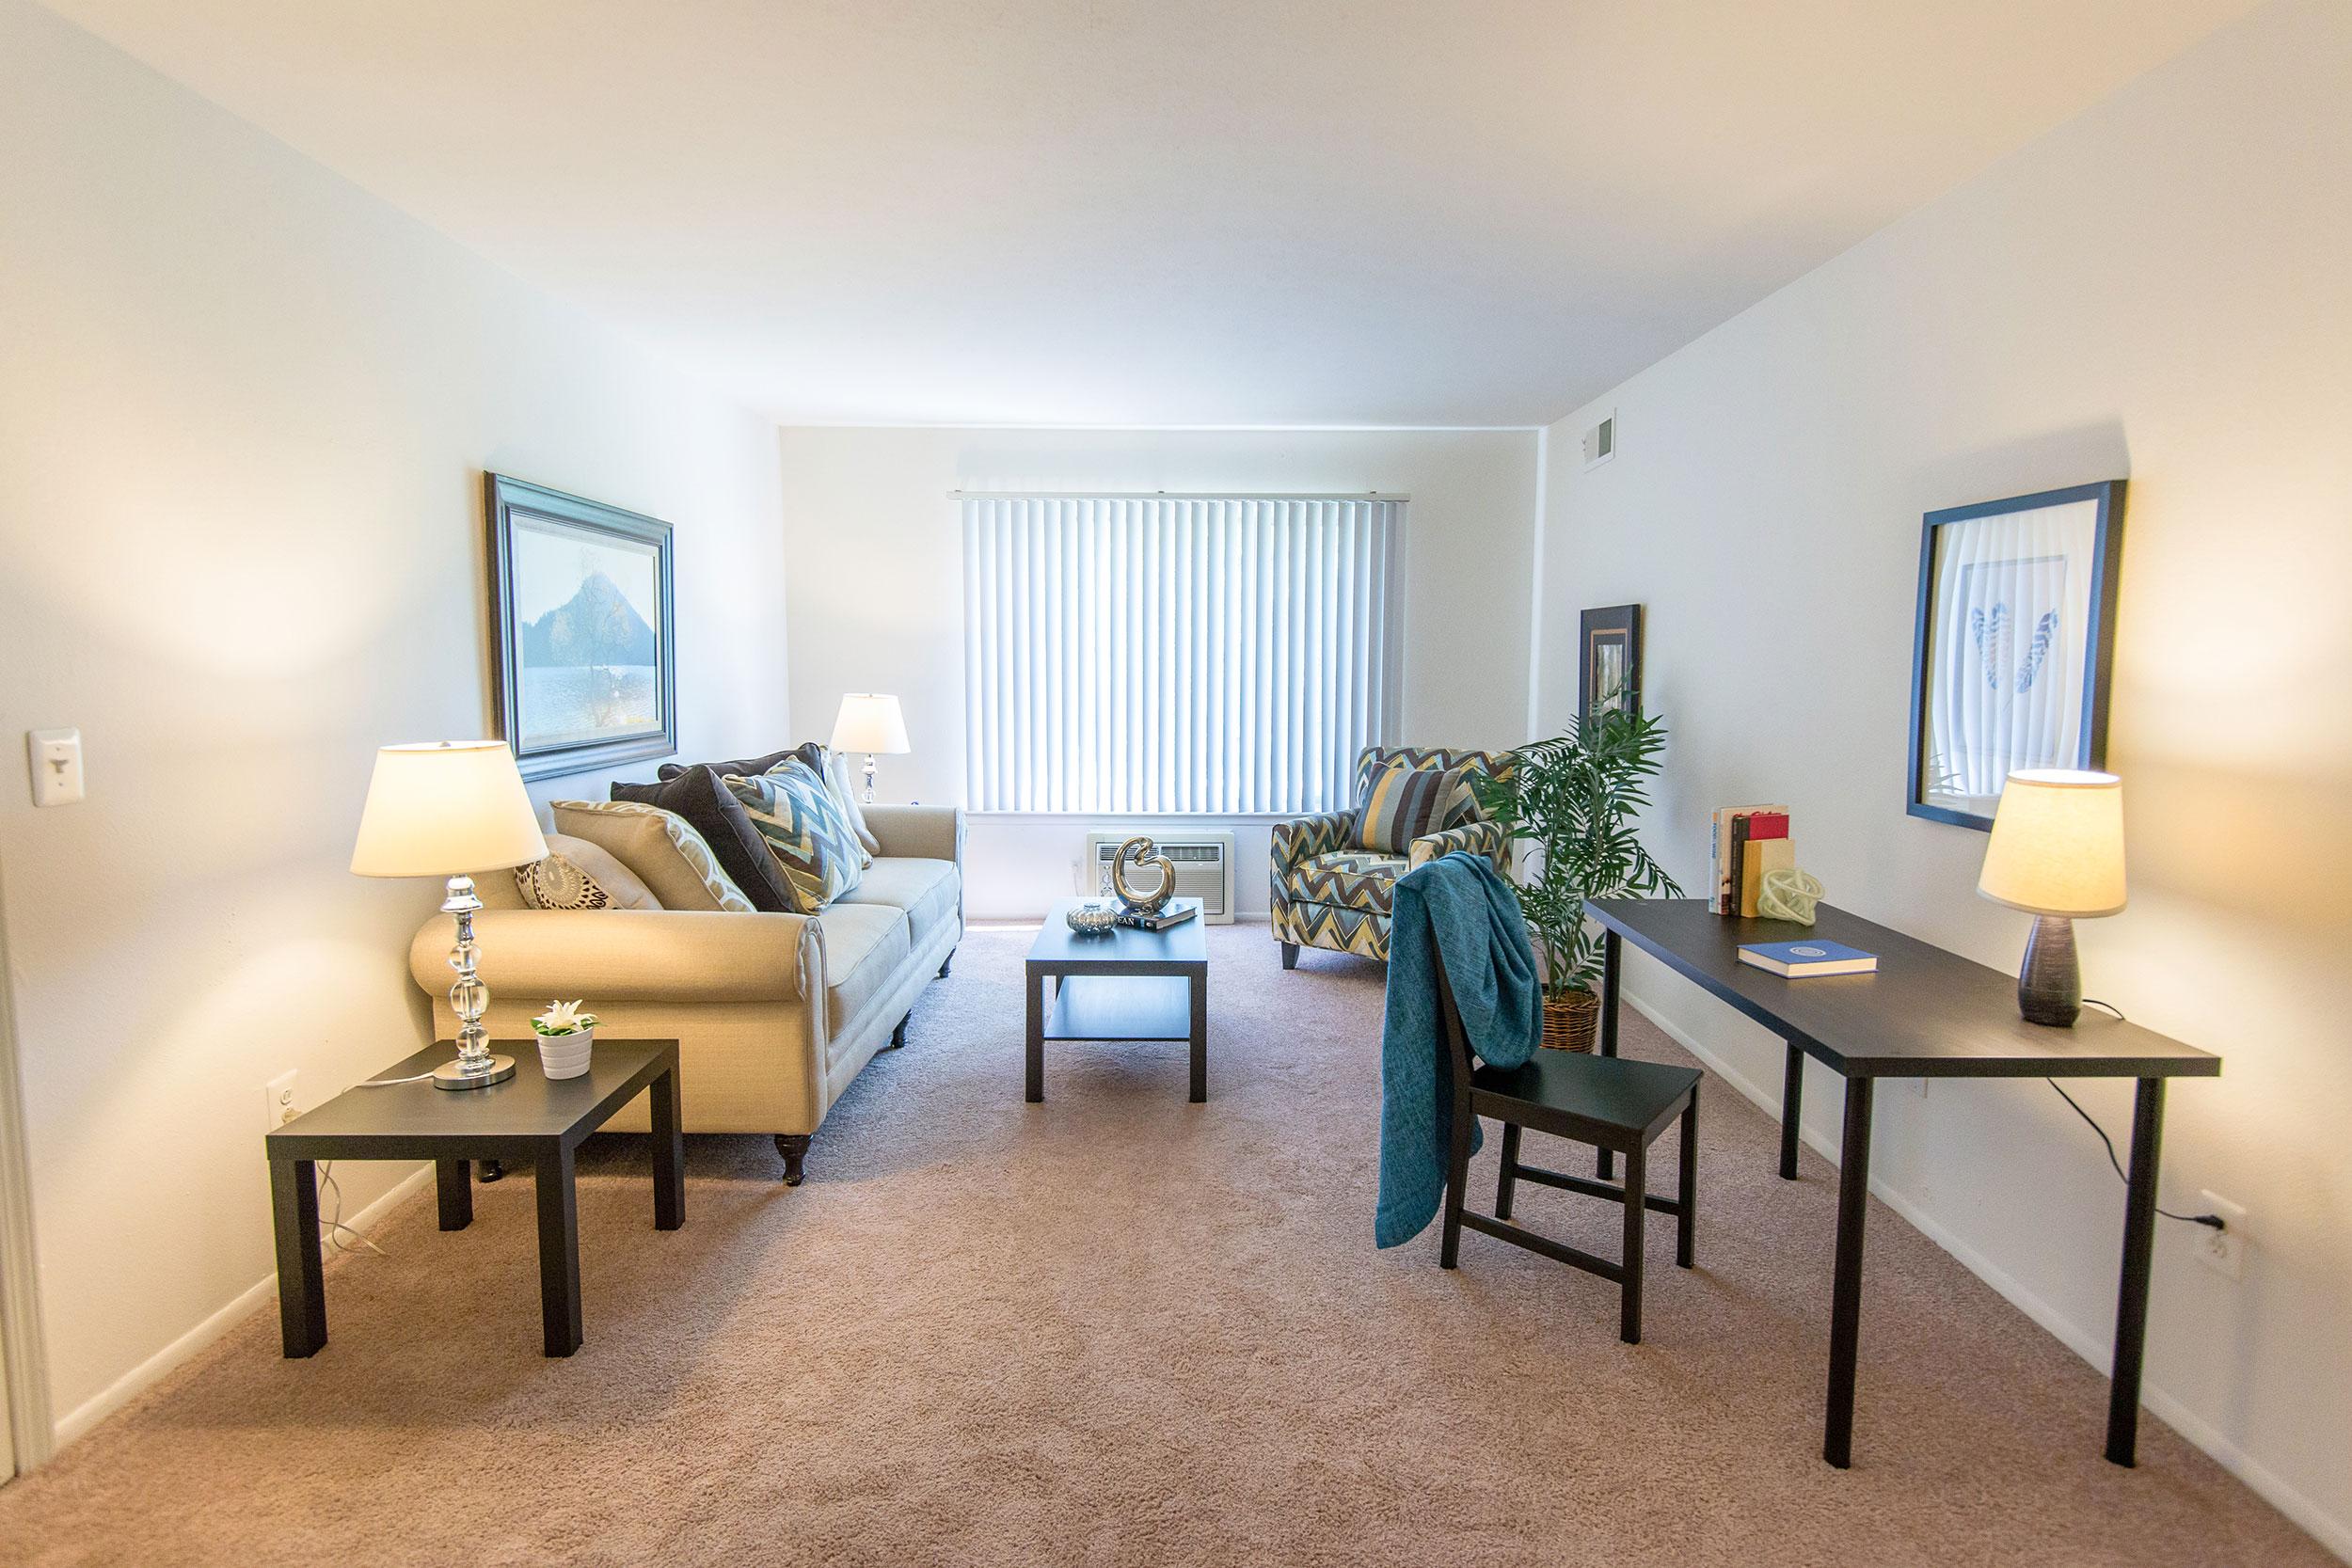 Evg-living-room